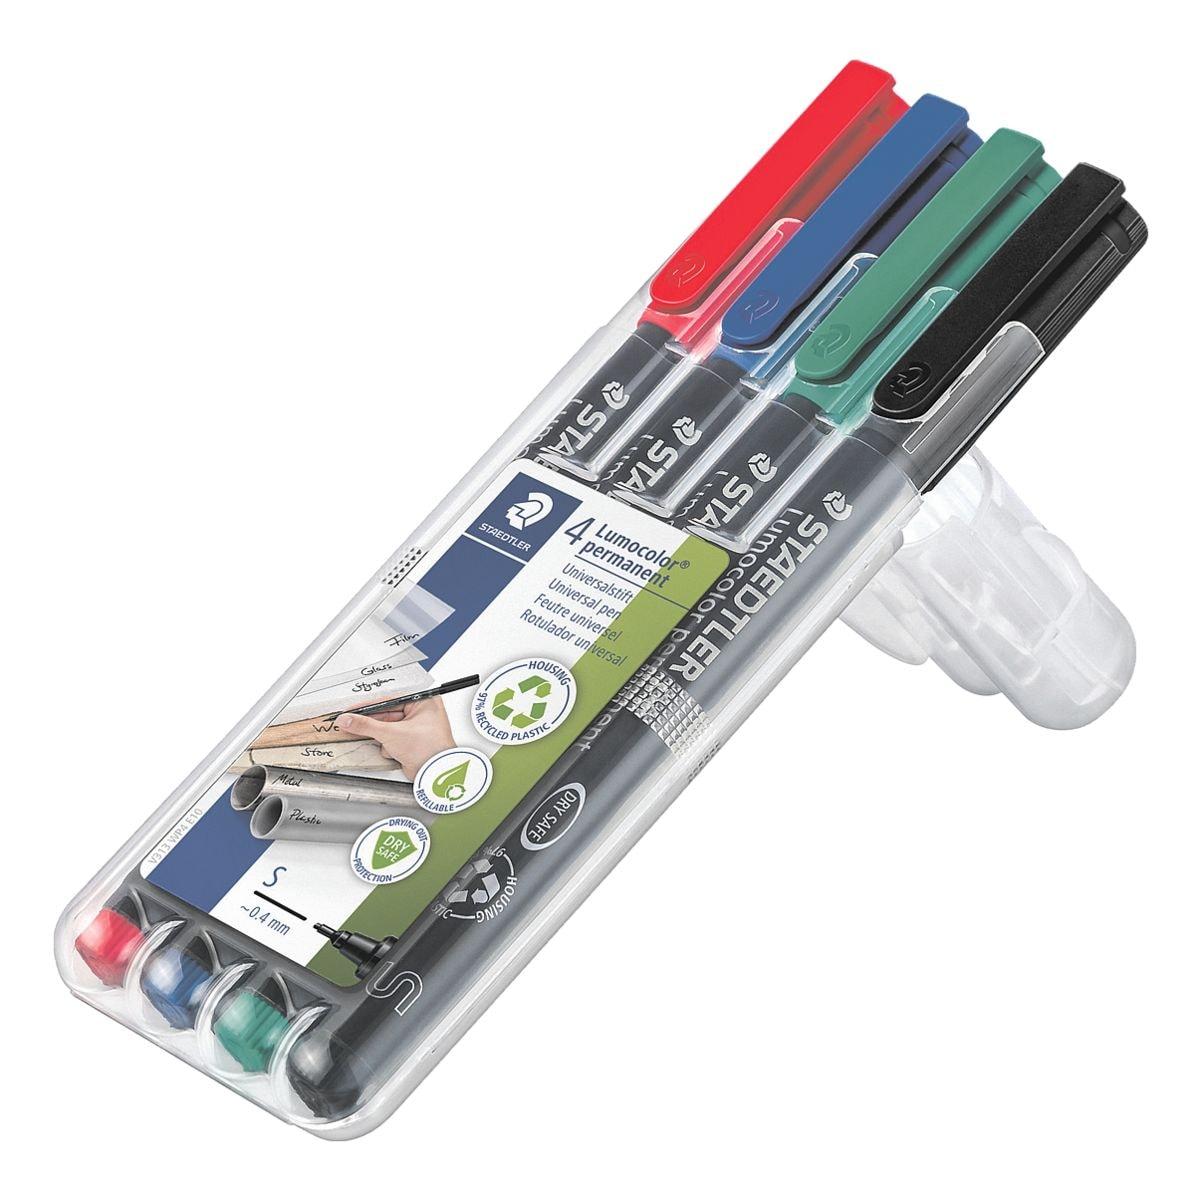 STAEDTLER Universalstift 4er-Pack Lumocolor permanent S - Rundspitze, Strichstärke 0,4 mm (S)